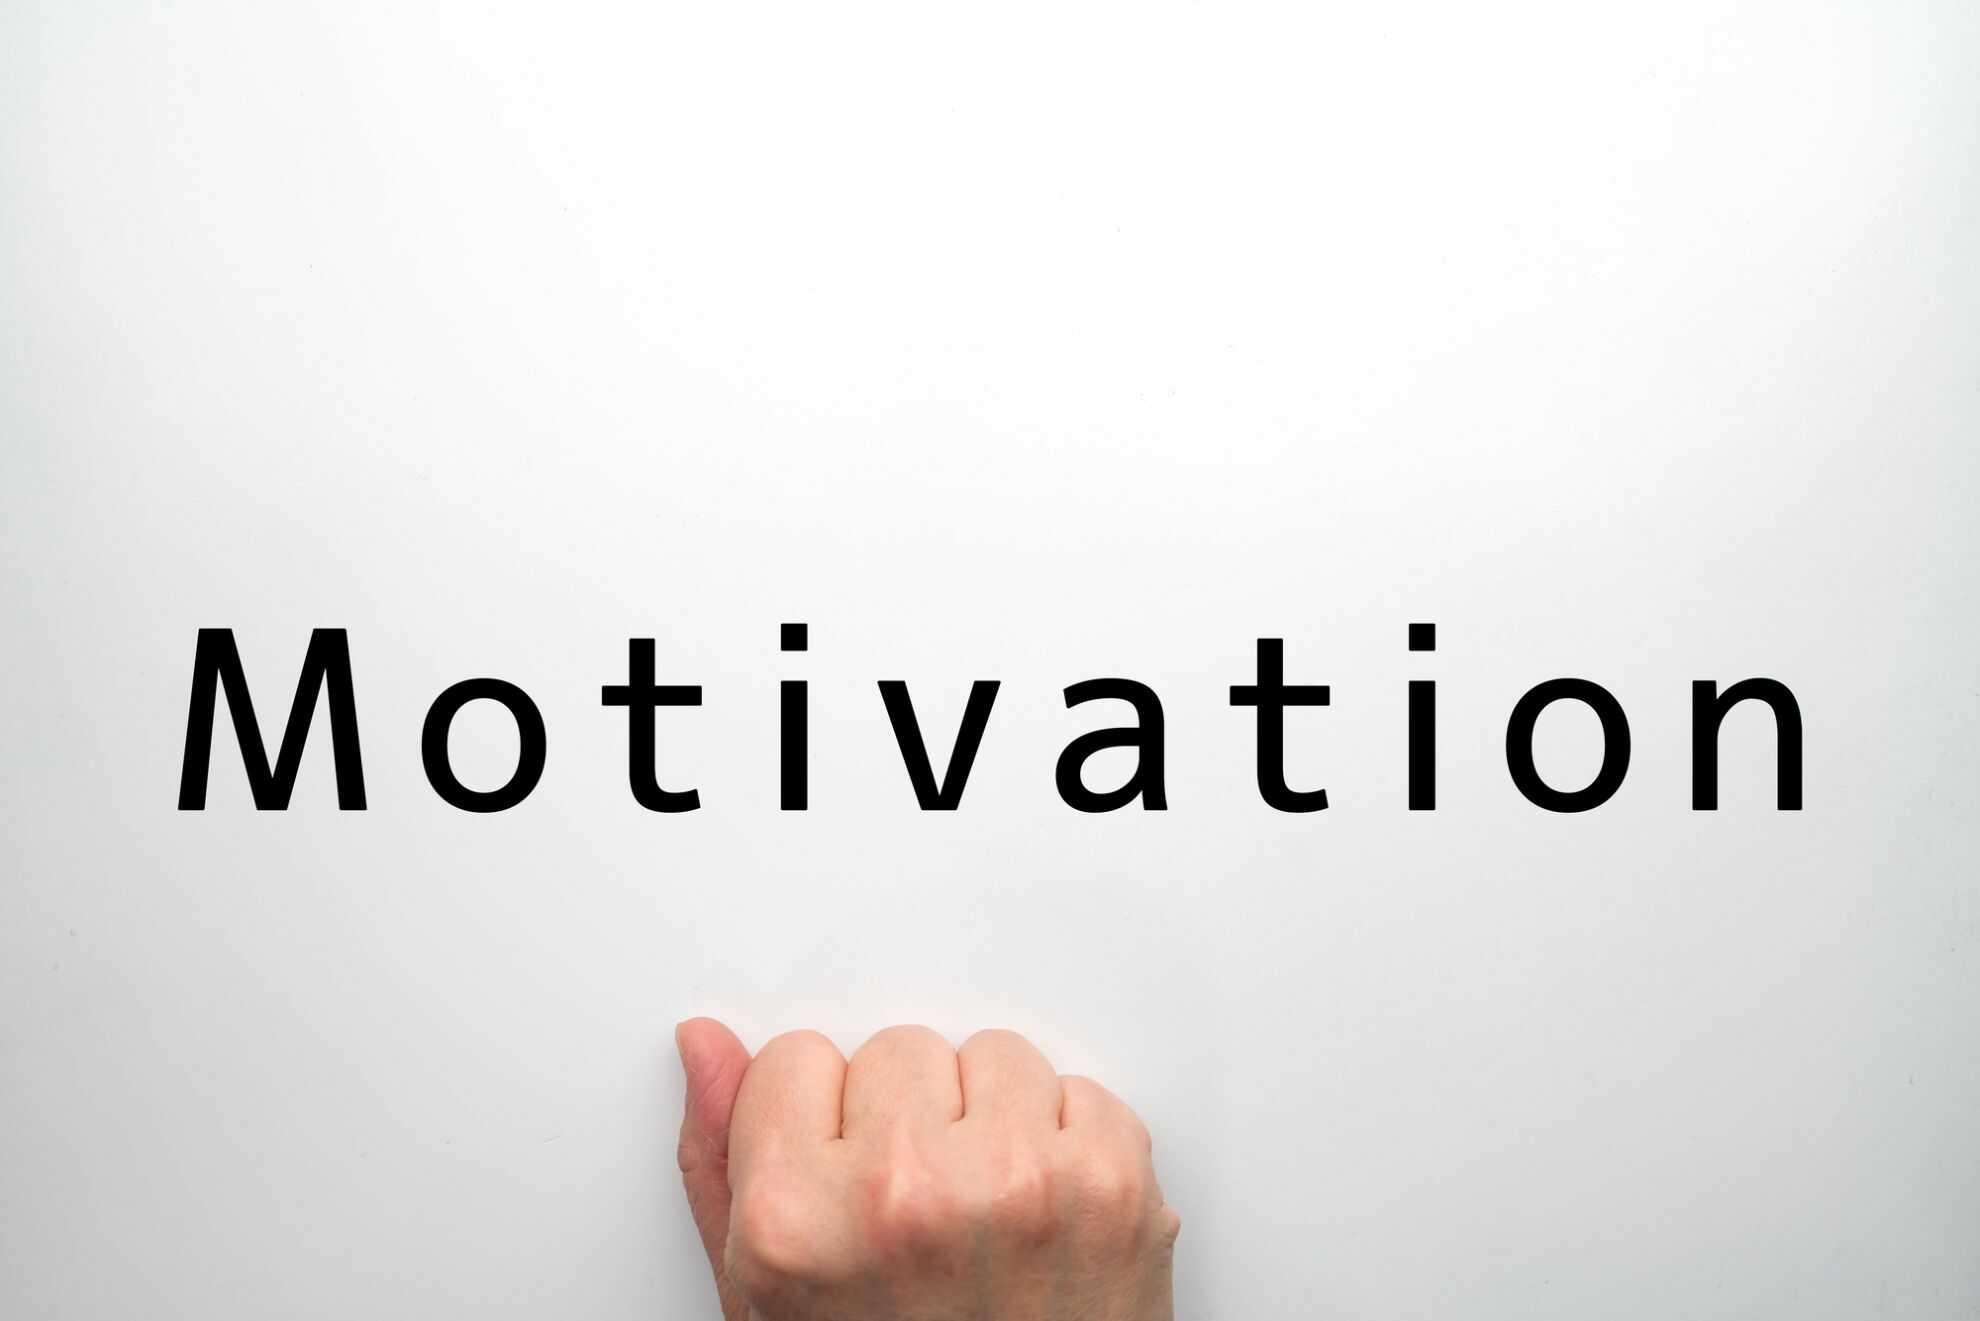 Motivation、心理学において「動機」や「動機付け」を意味する言葉